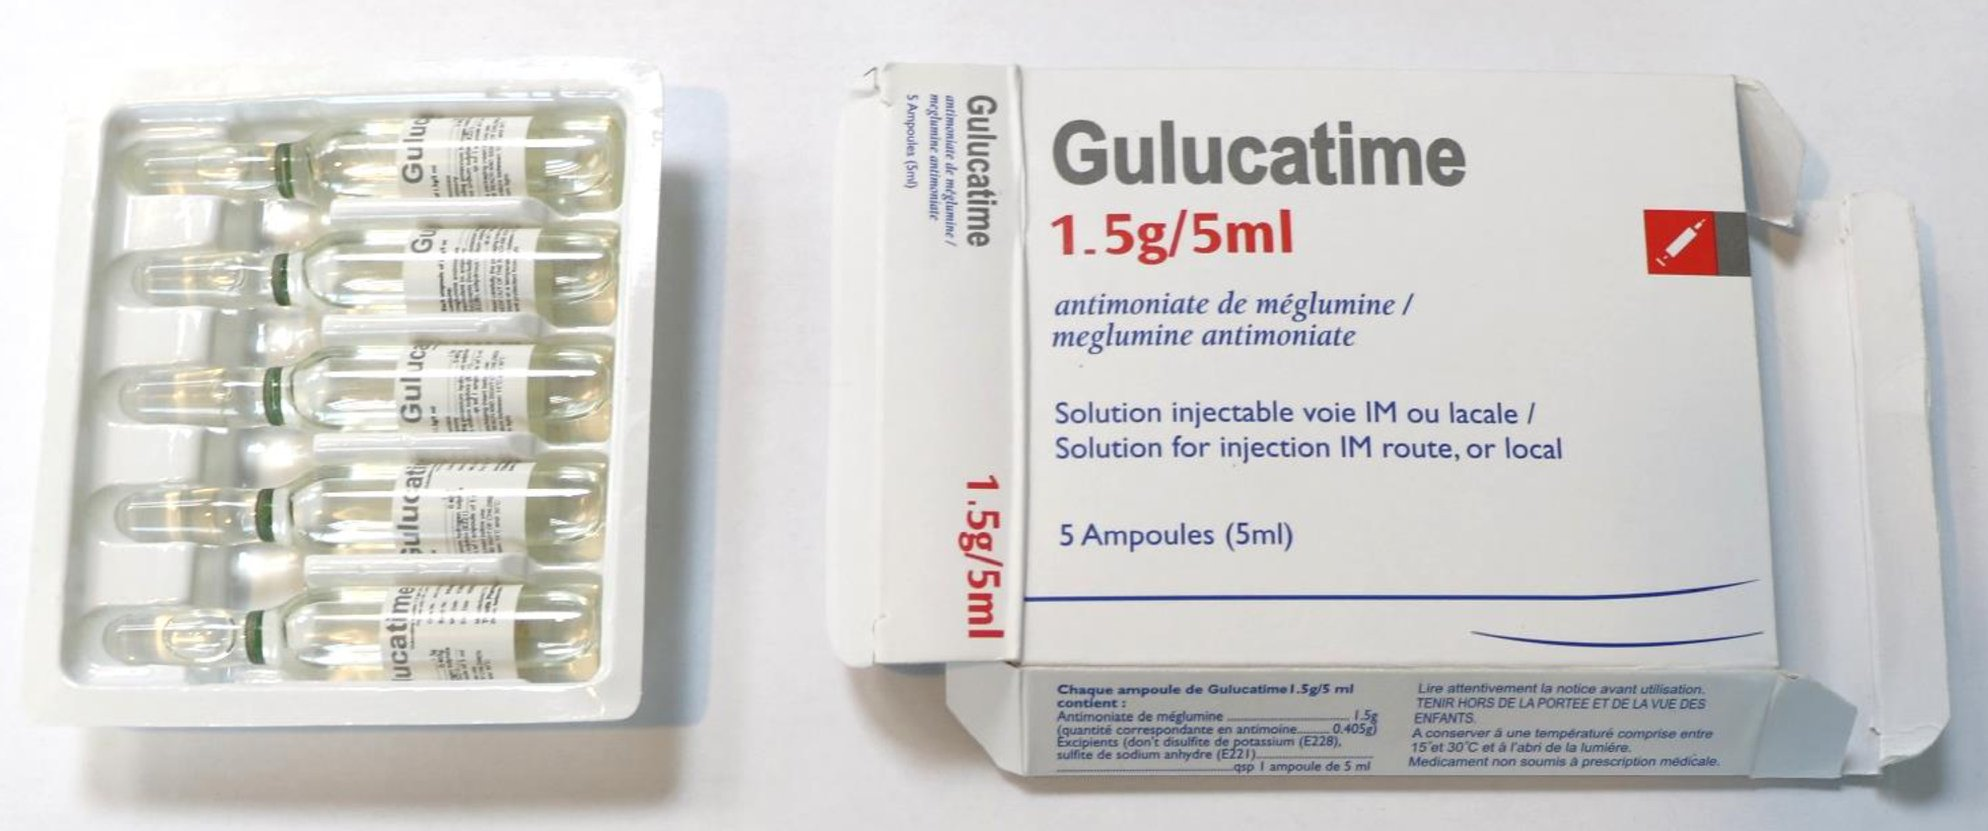 Fake Meglumine antimoniate In Circulation